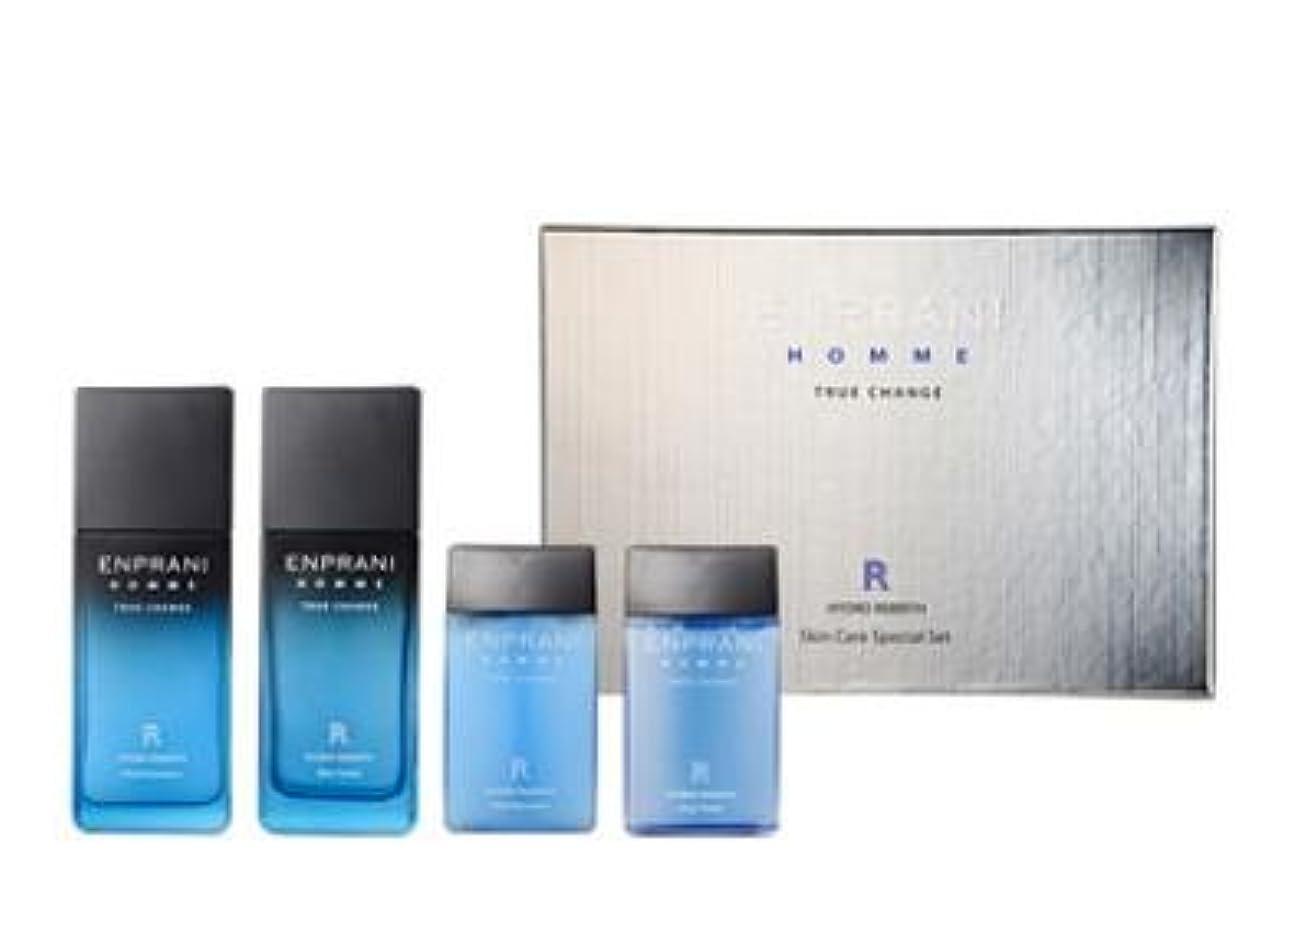 ENPRANI Homme Hydro Rebirth 2-piece set エンプラニ オムハイドロ リバース2種セット [並行輸入品]